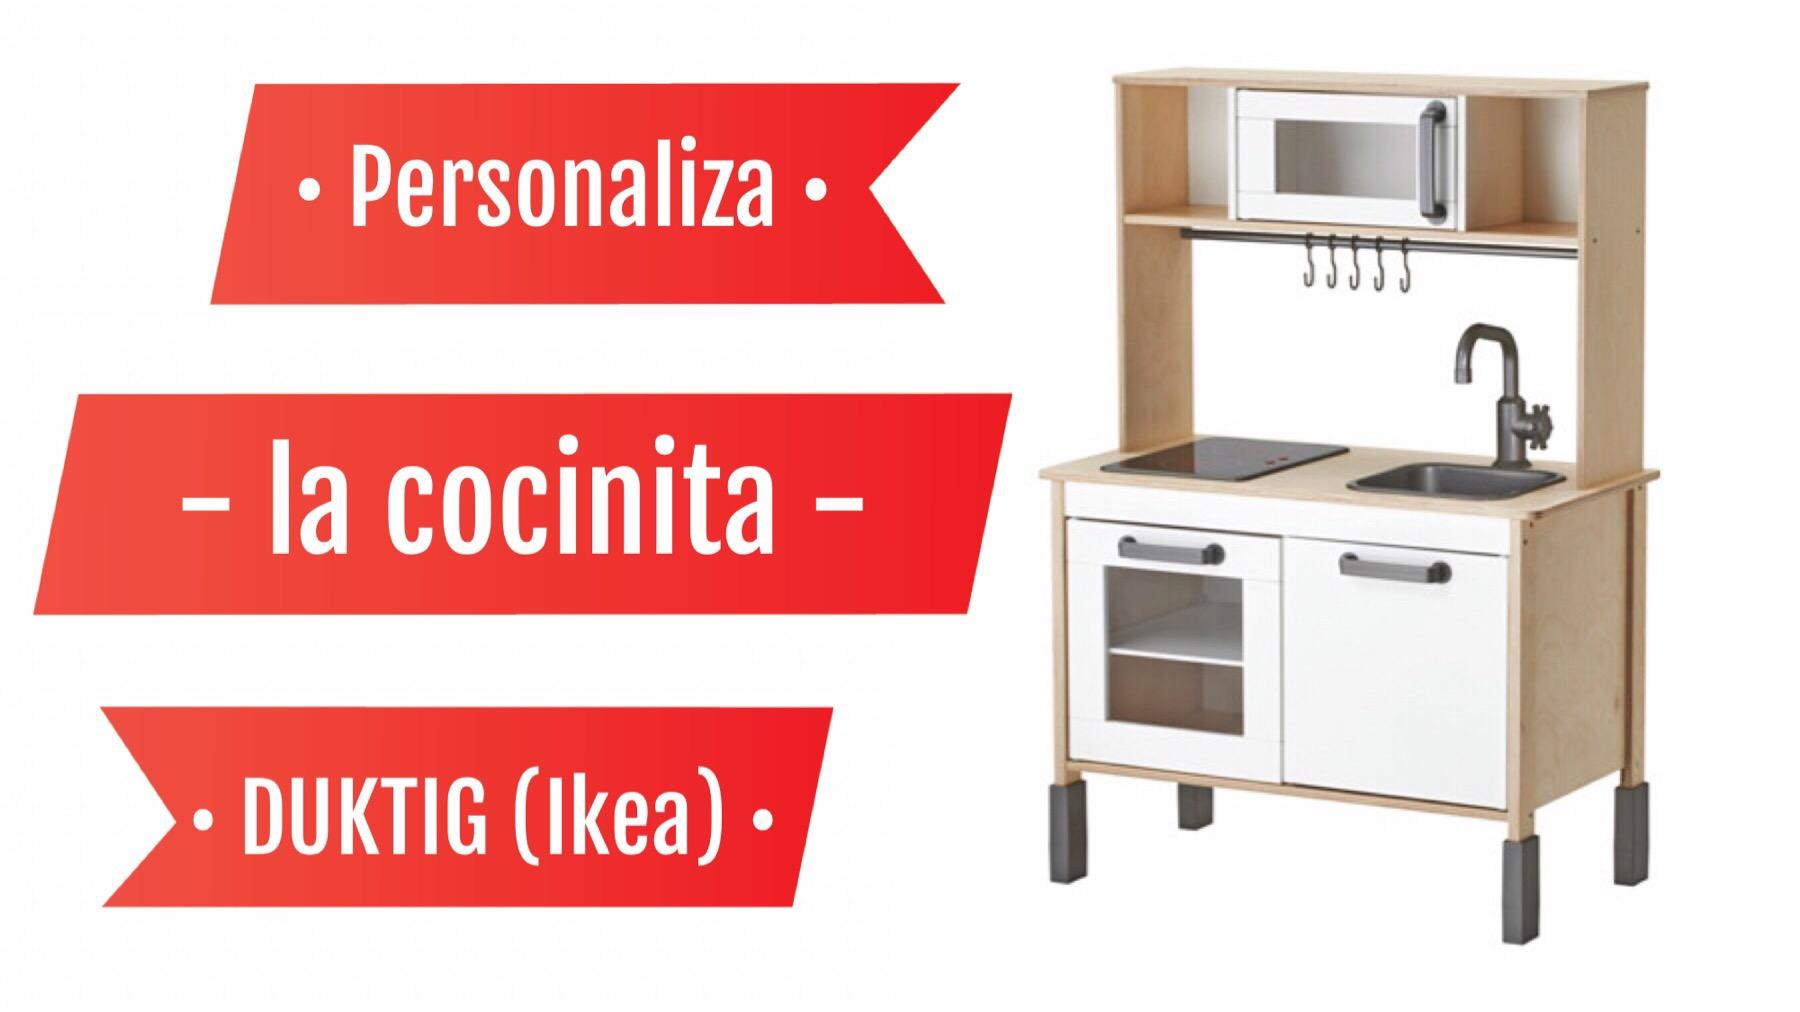 Personaliza La Cocinita Duktig Ikea